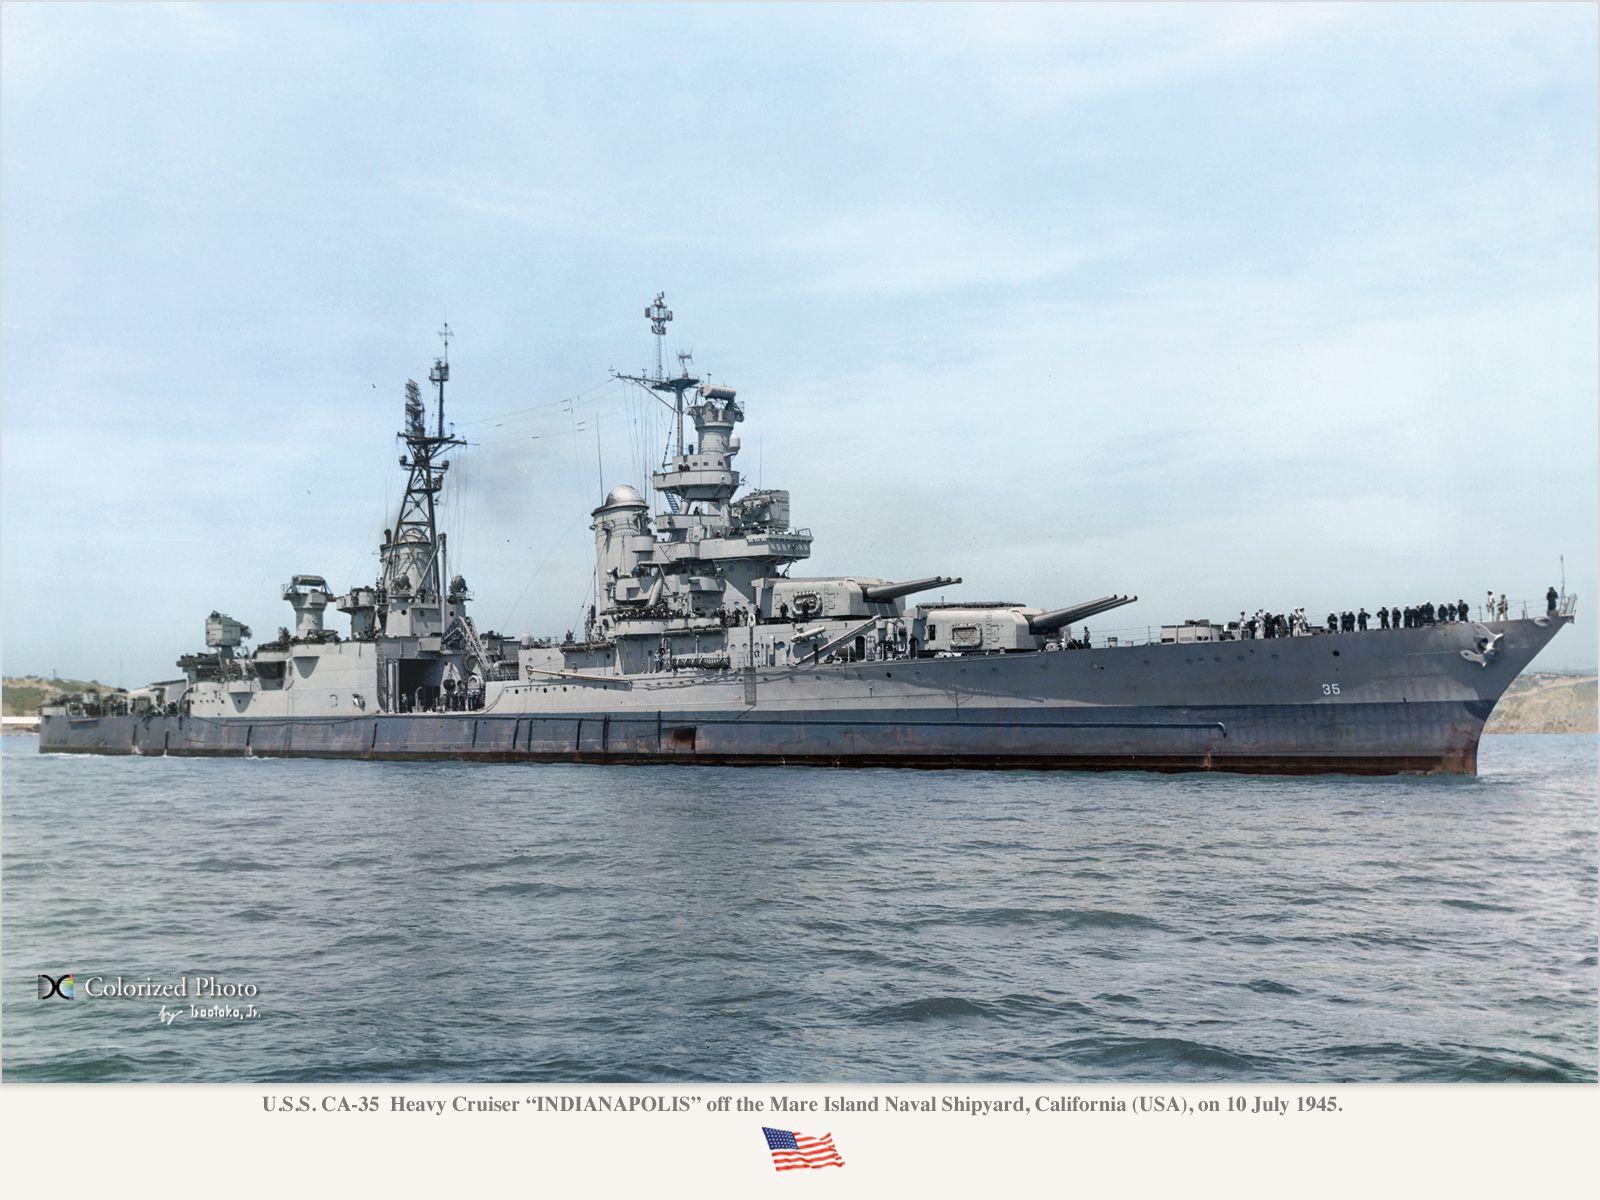 Portland Class Heavy Cruiser Uss Indianapolis Ca 35 Off Mare Island Naval Shipyard Ca On July 10 1945 20 Days B In 2020 Uss Indianapolis Heavy Cruiser Battleship